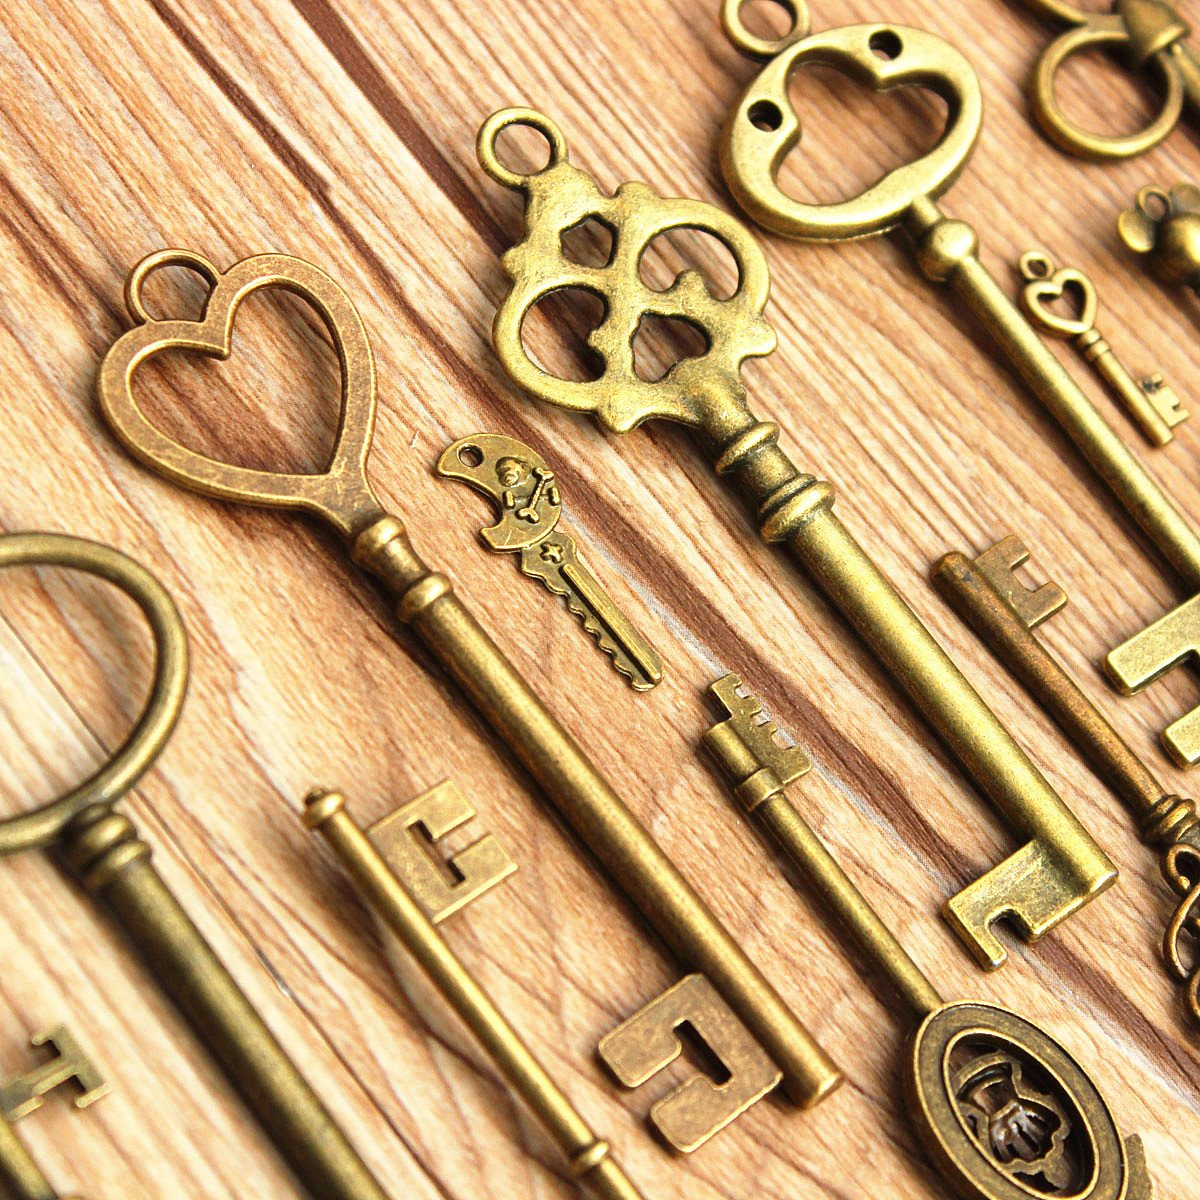 KINGSO Antique Vintage Bronze Skeleton Key Charms Set DIY Necklace Pendant Jewelry Making Supplies (70pcs)